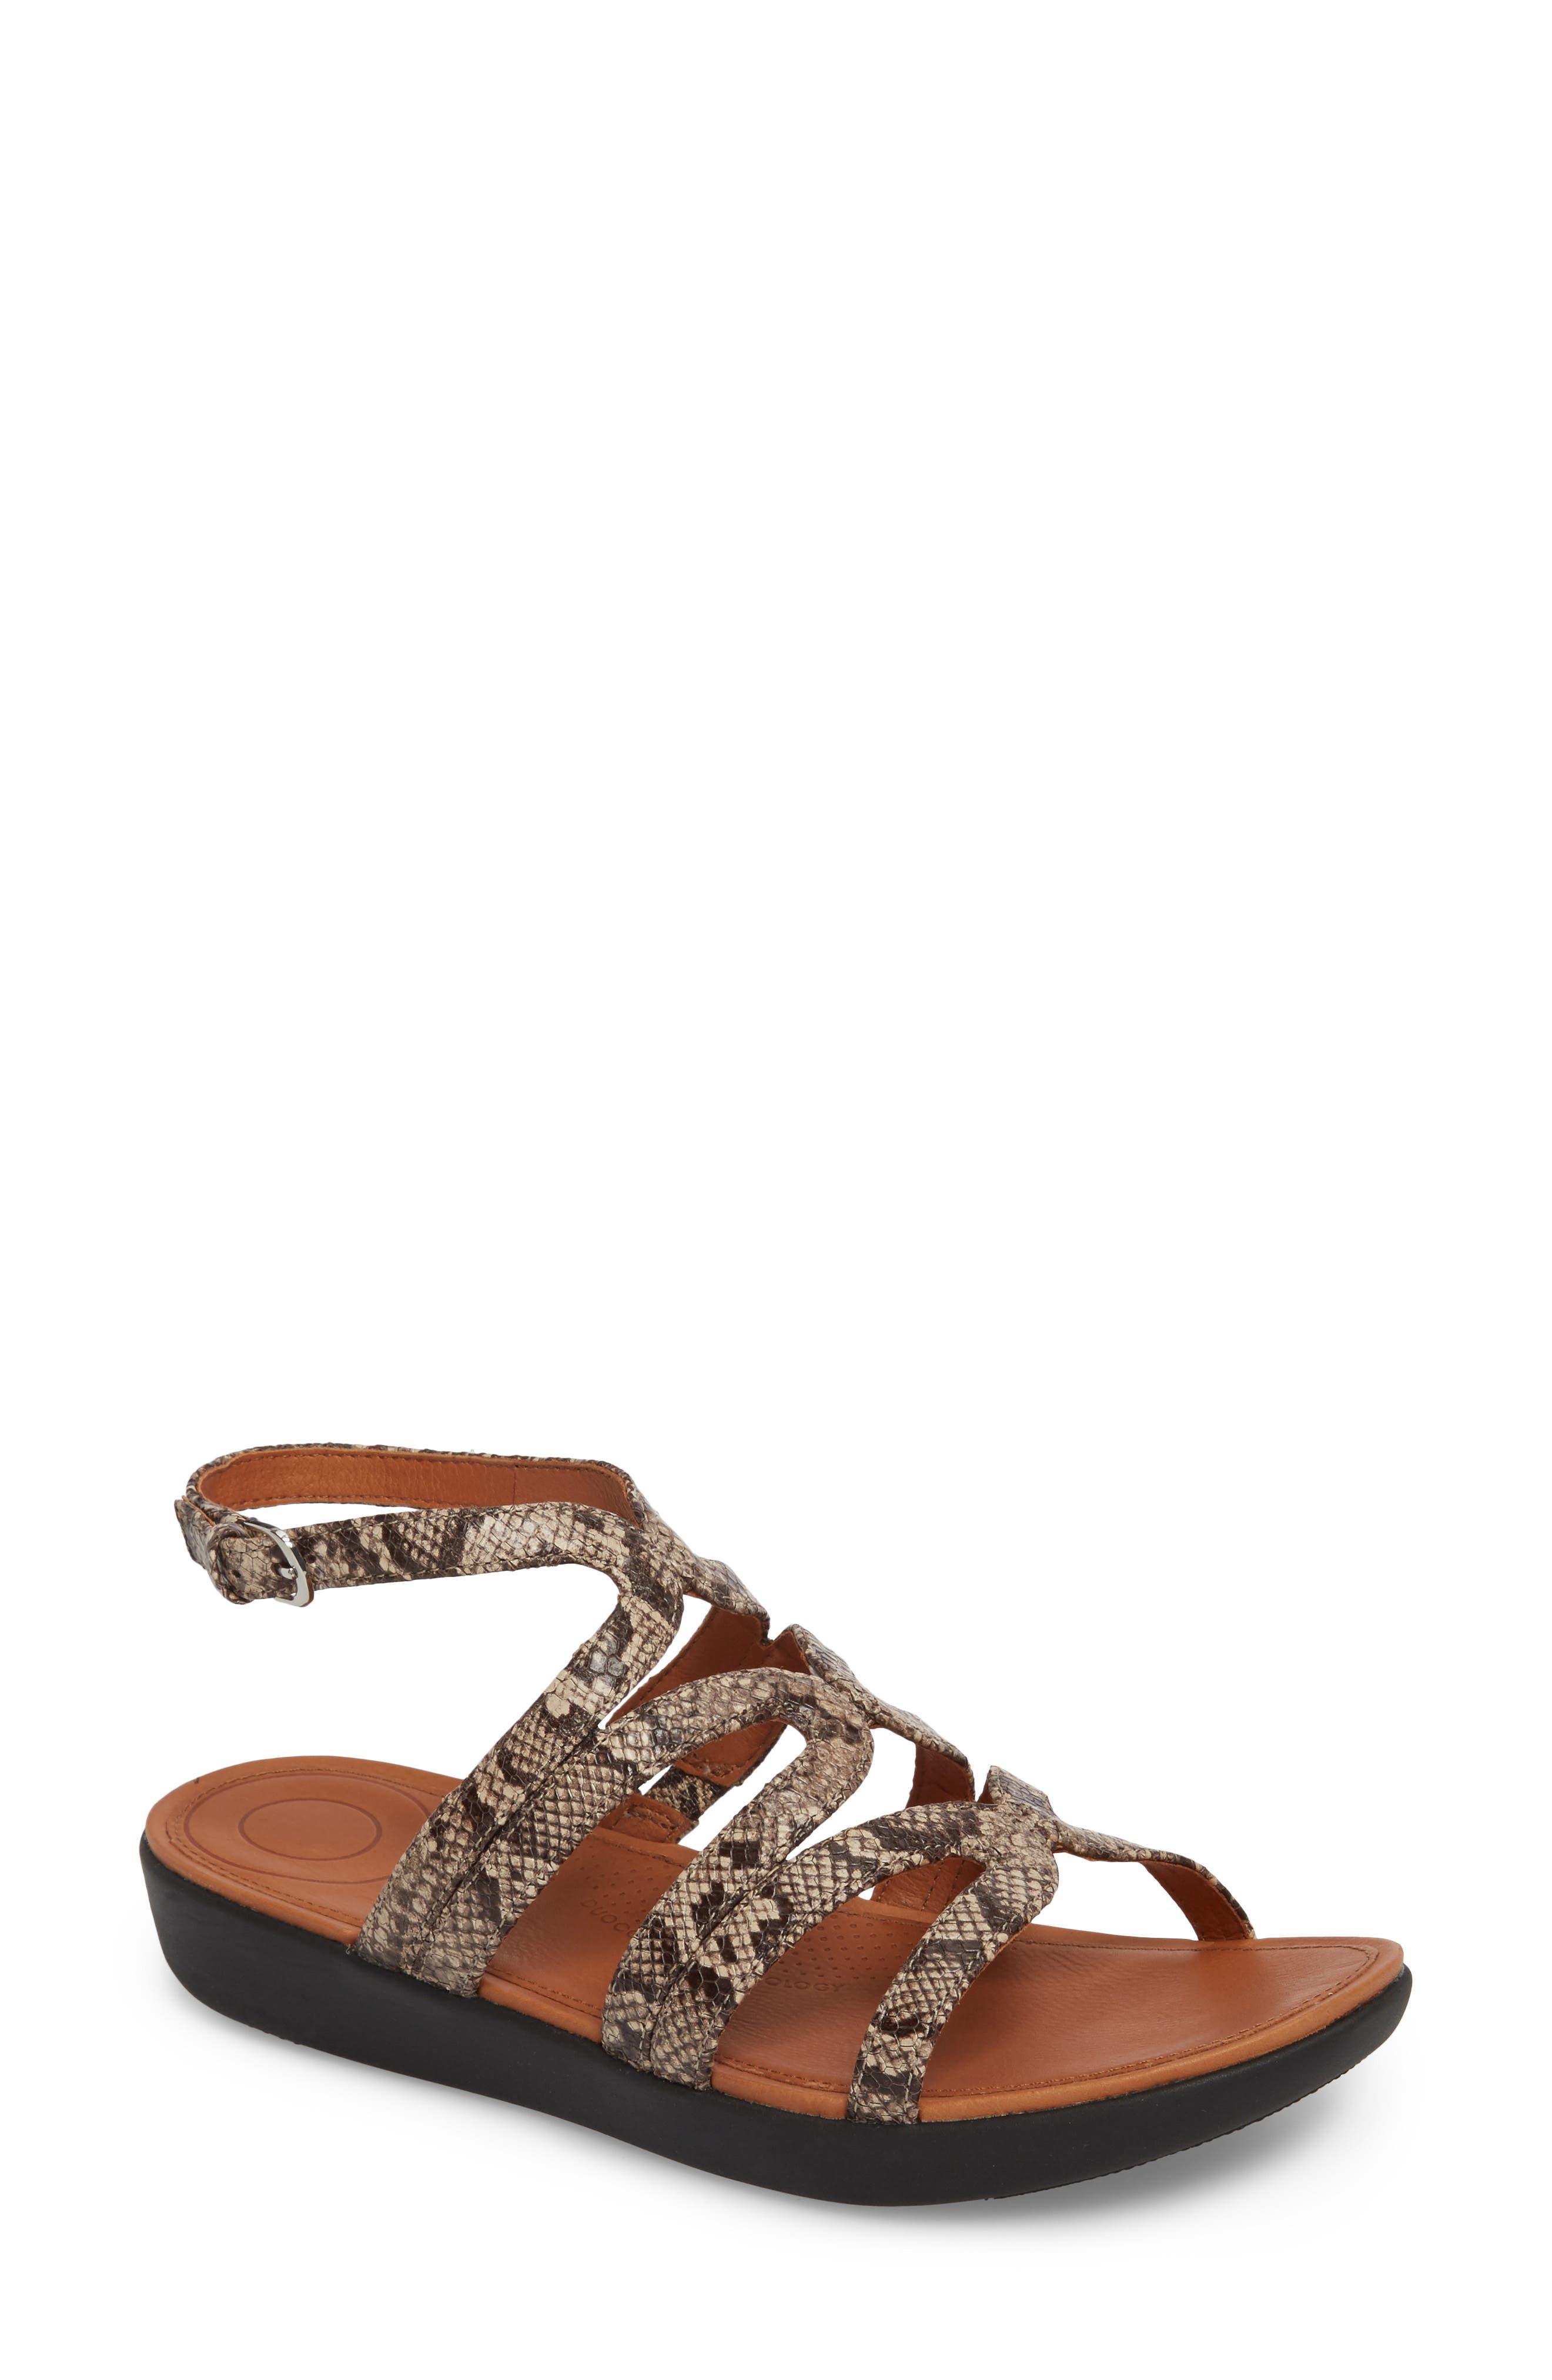 Strata Gladiator Sandal,                             Main thumbnail 1, color,                             Taupe Snake Print Leather